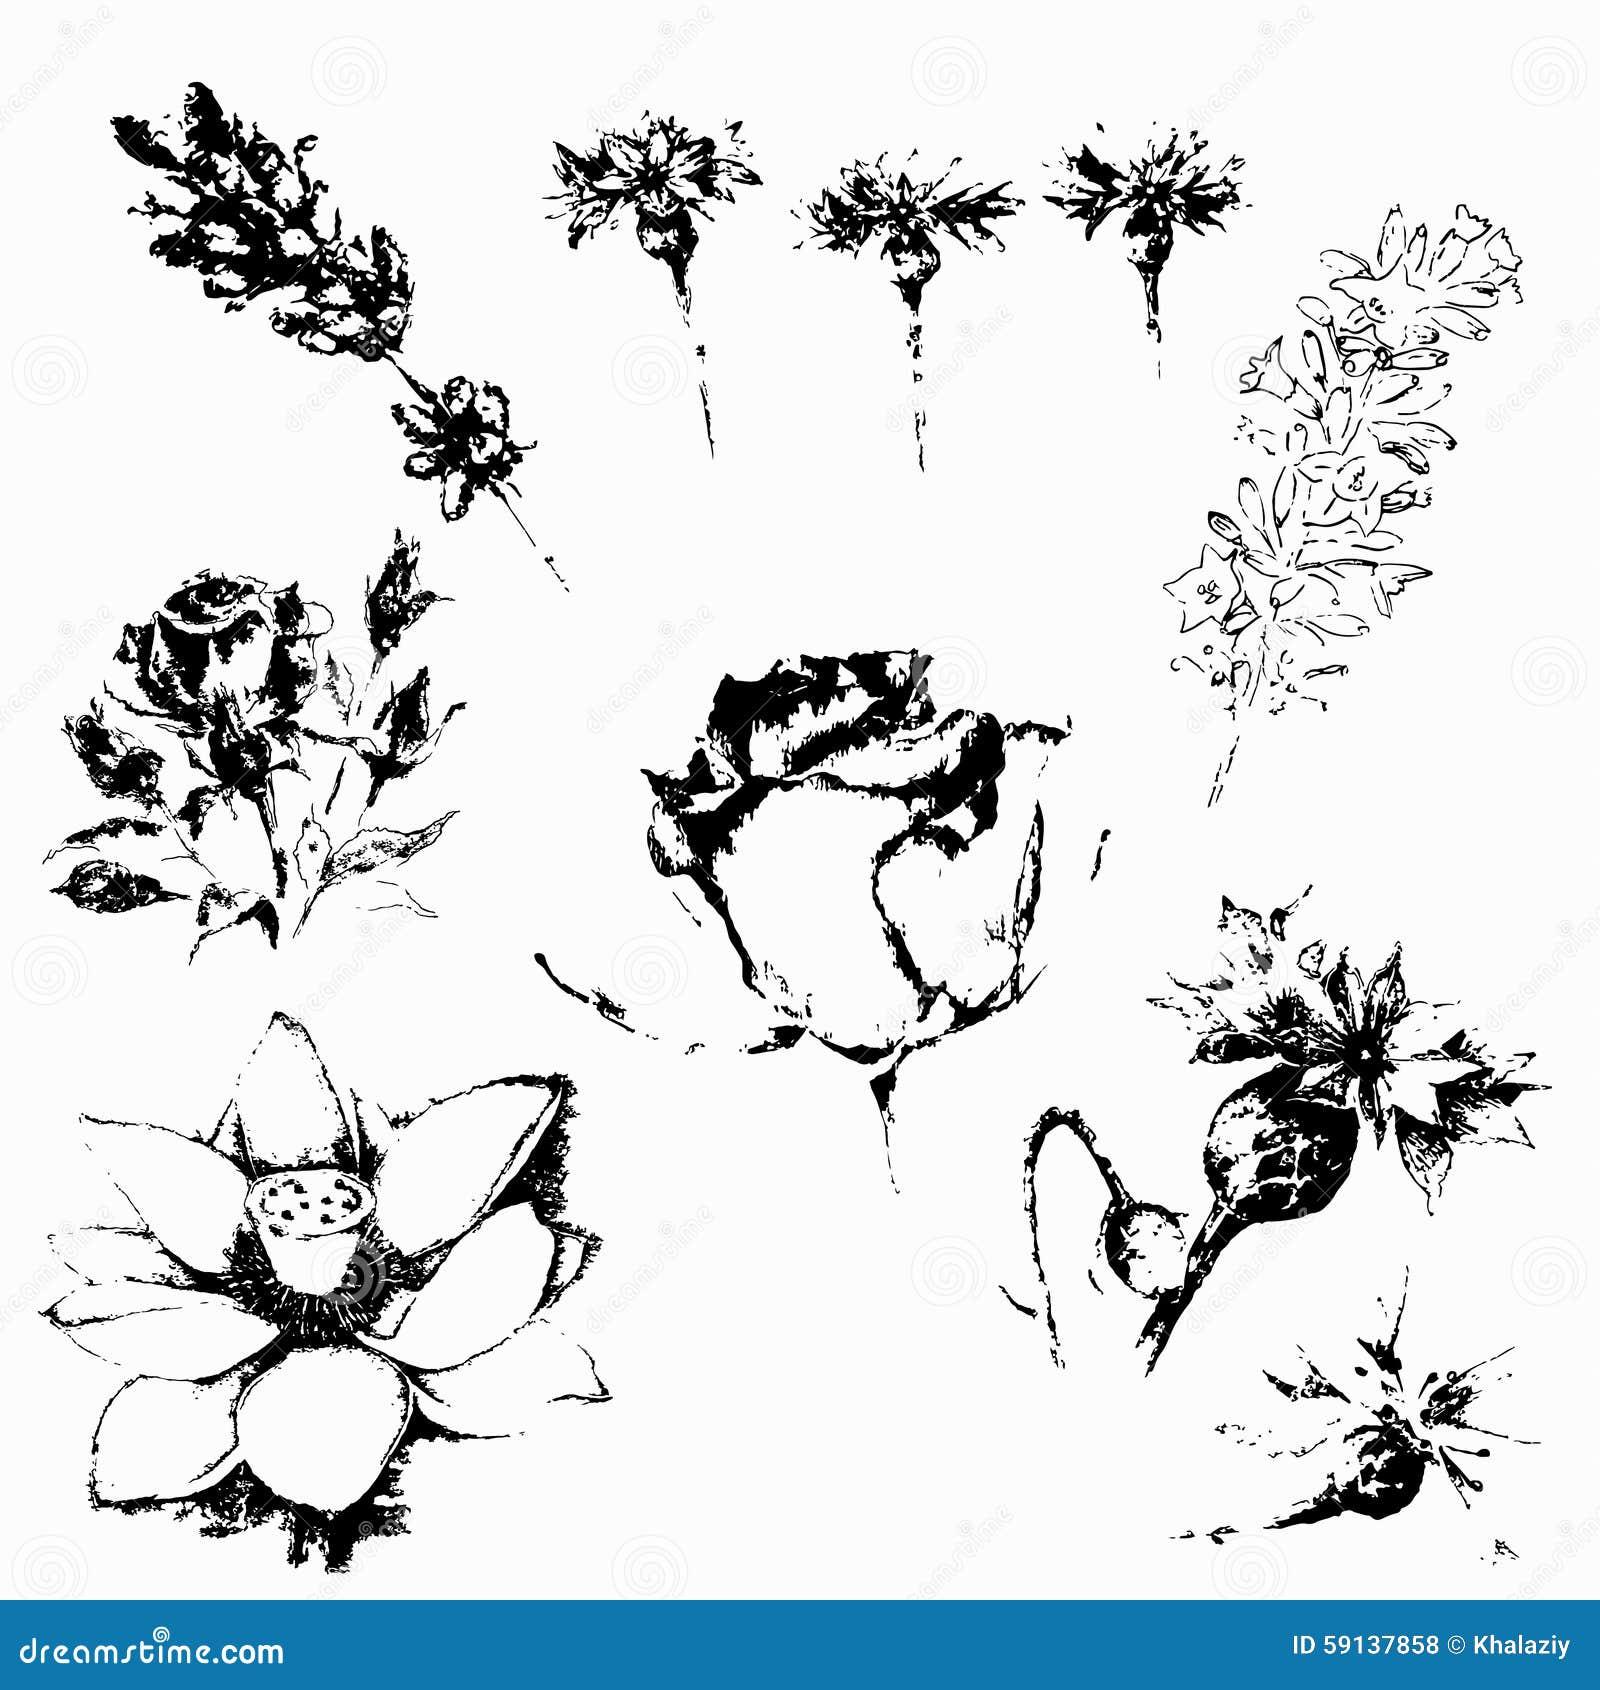 Botanical Illustration Of Flowers In Black And White Stock Vector